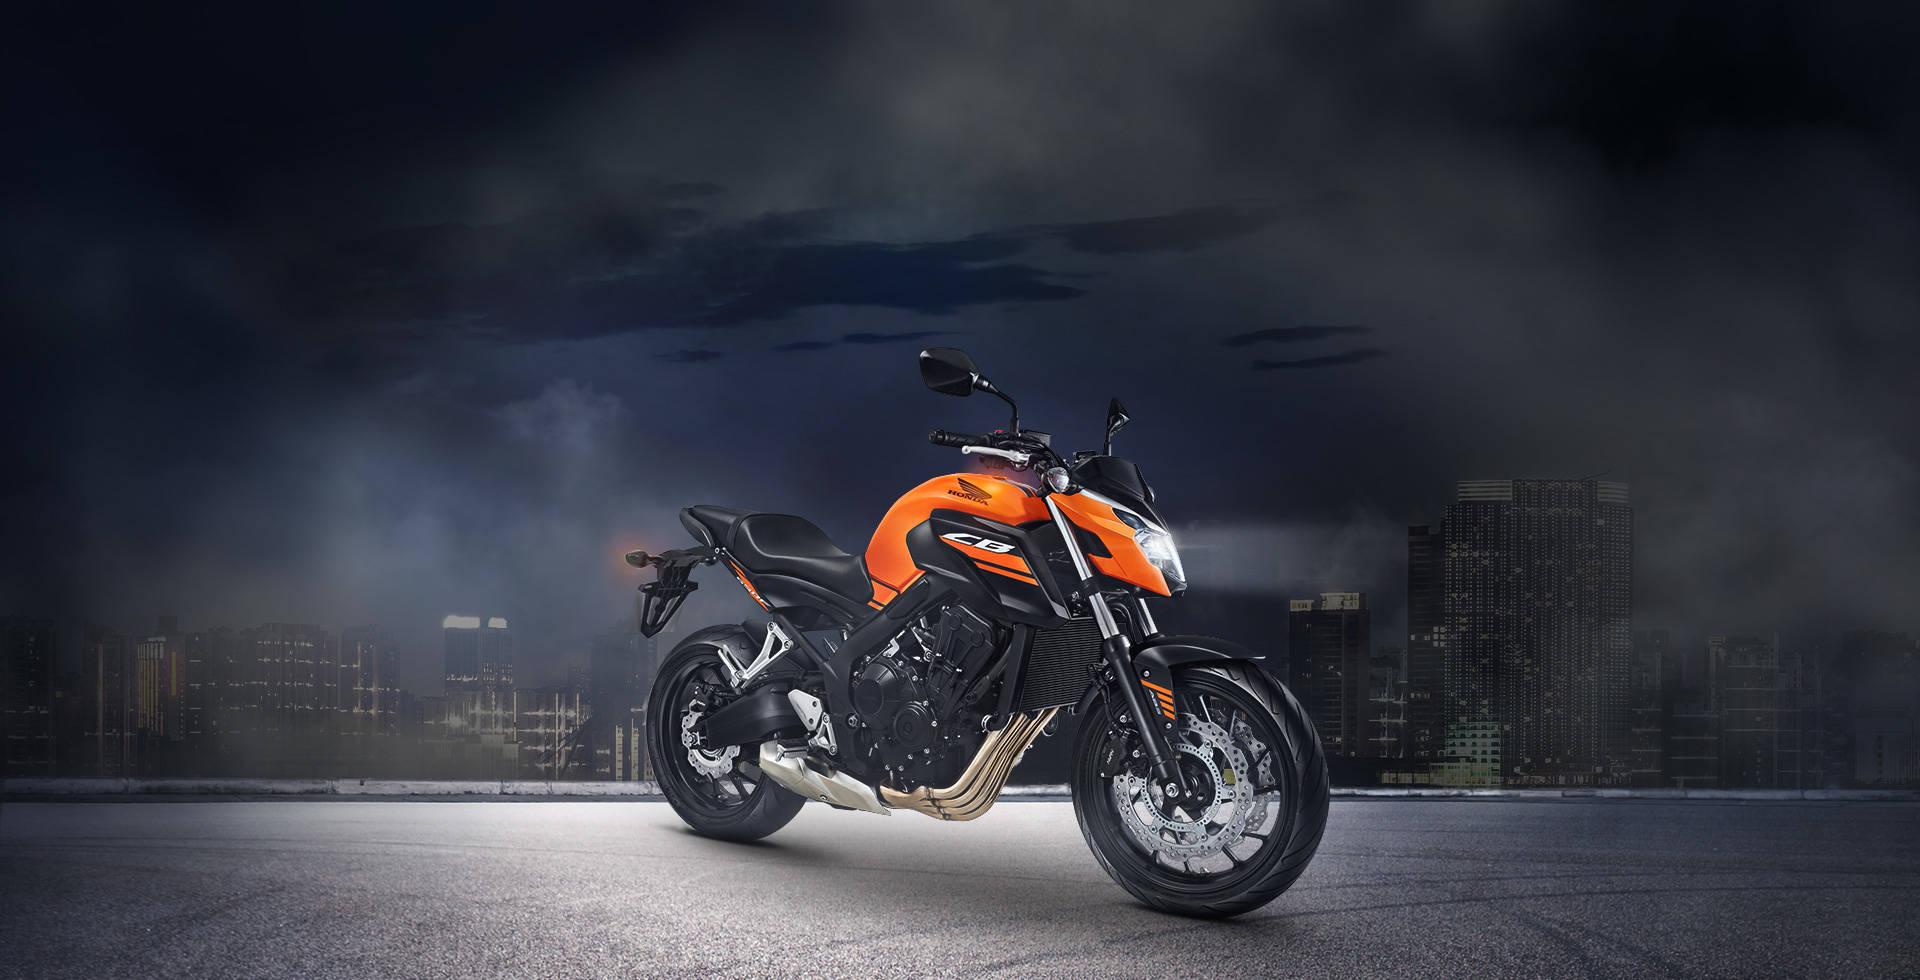 cb 650f 2018 honda motocicletas. Black Bedroom Furniture Sets. Home Design Ideas